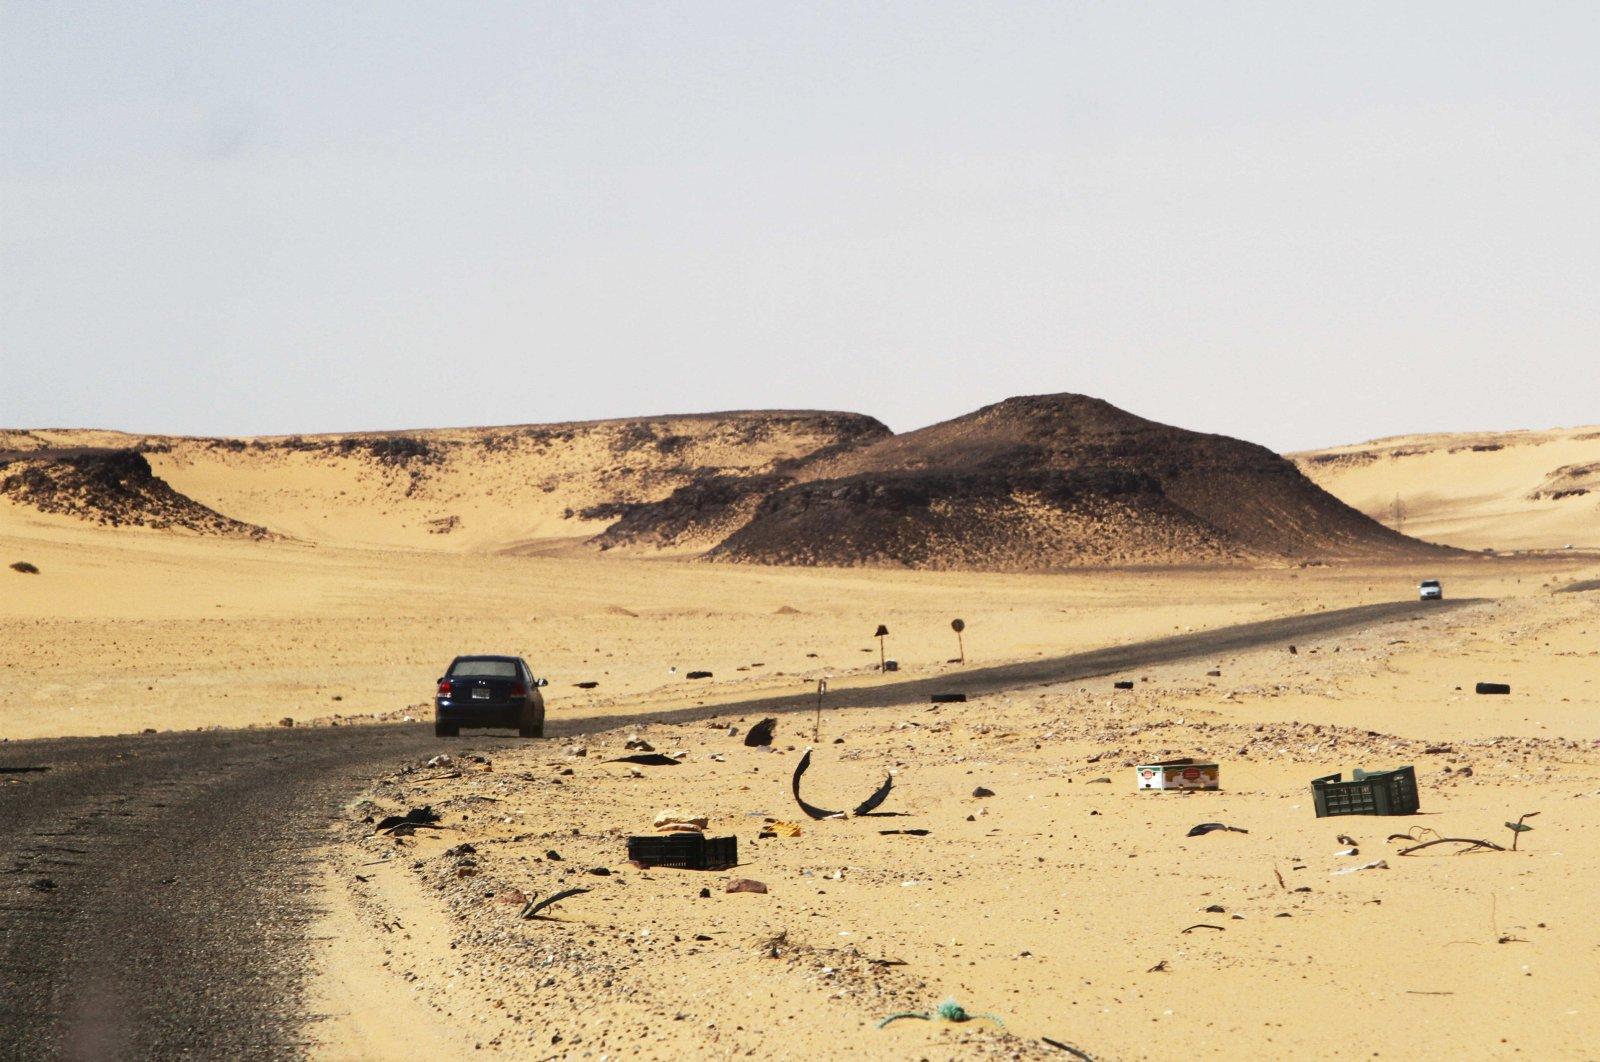 A car driving along the bandit-plagued road between Sebha and Ubari in southwestern Libya, Dec. 24, 2013. (AP File Photo)